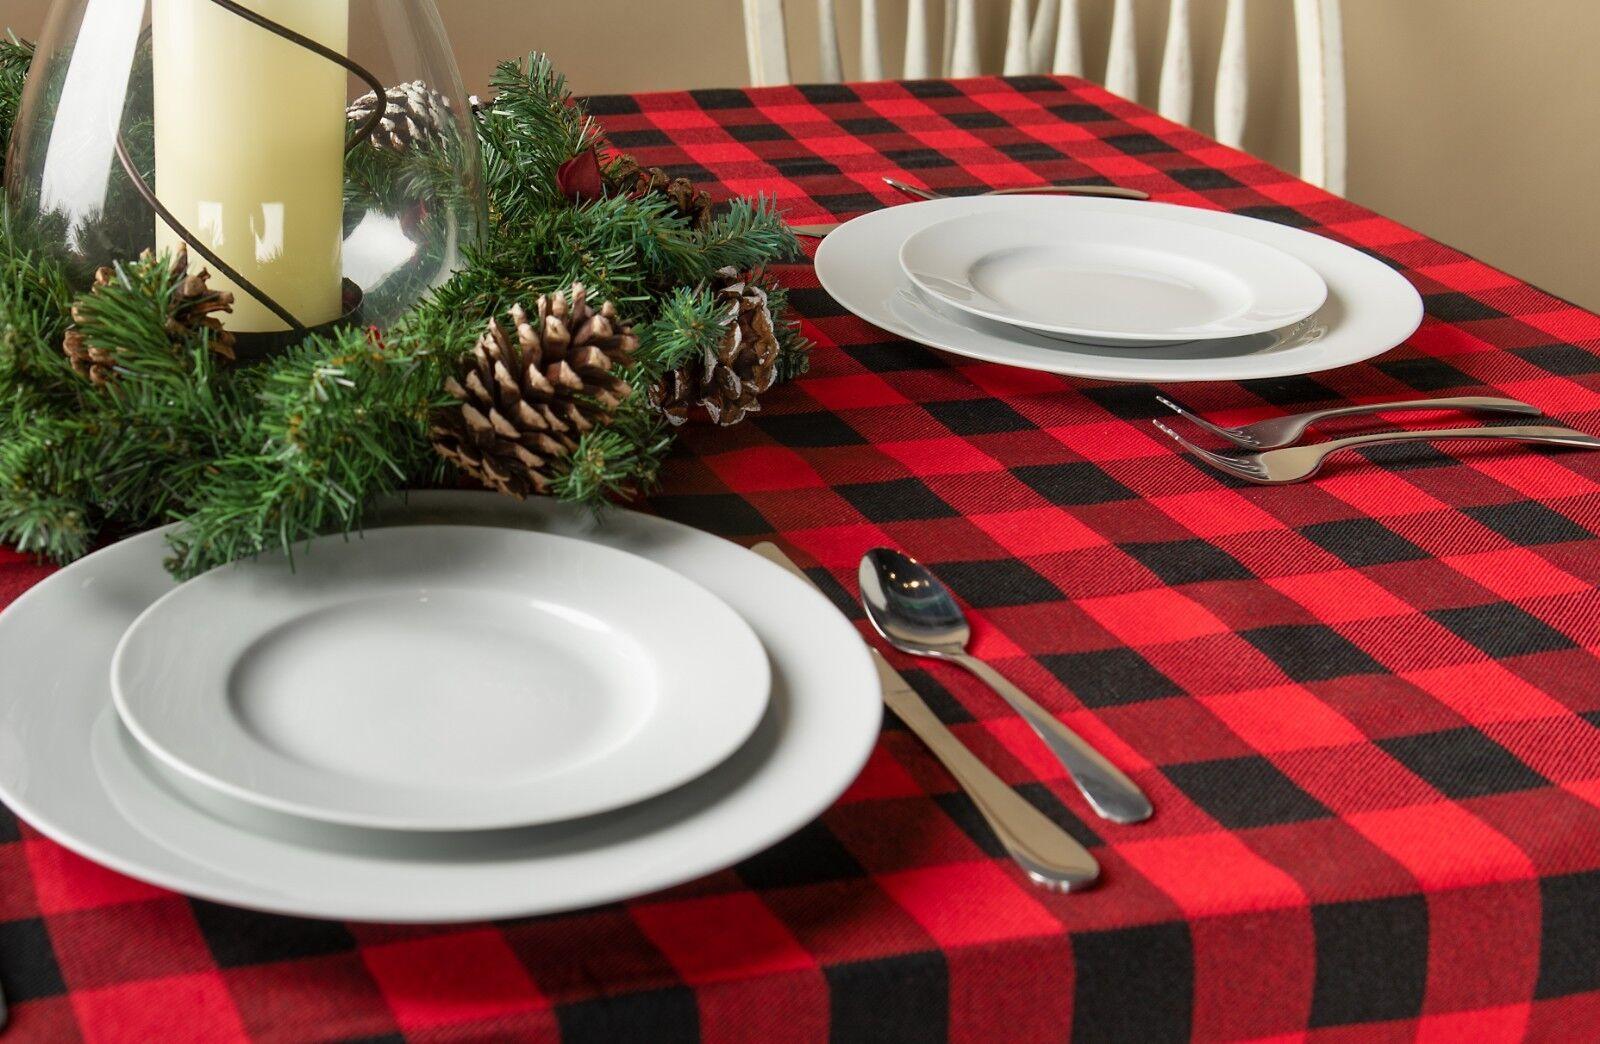 New Buffalo Check Lumberjack Plaid Vinyl Tablecloth 52 X 70